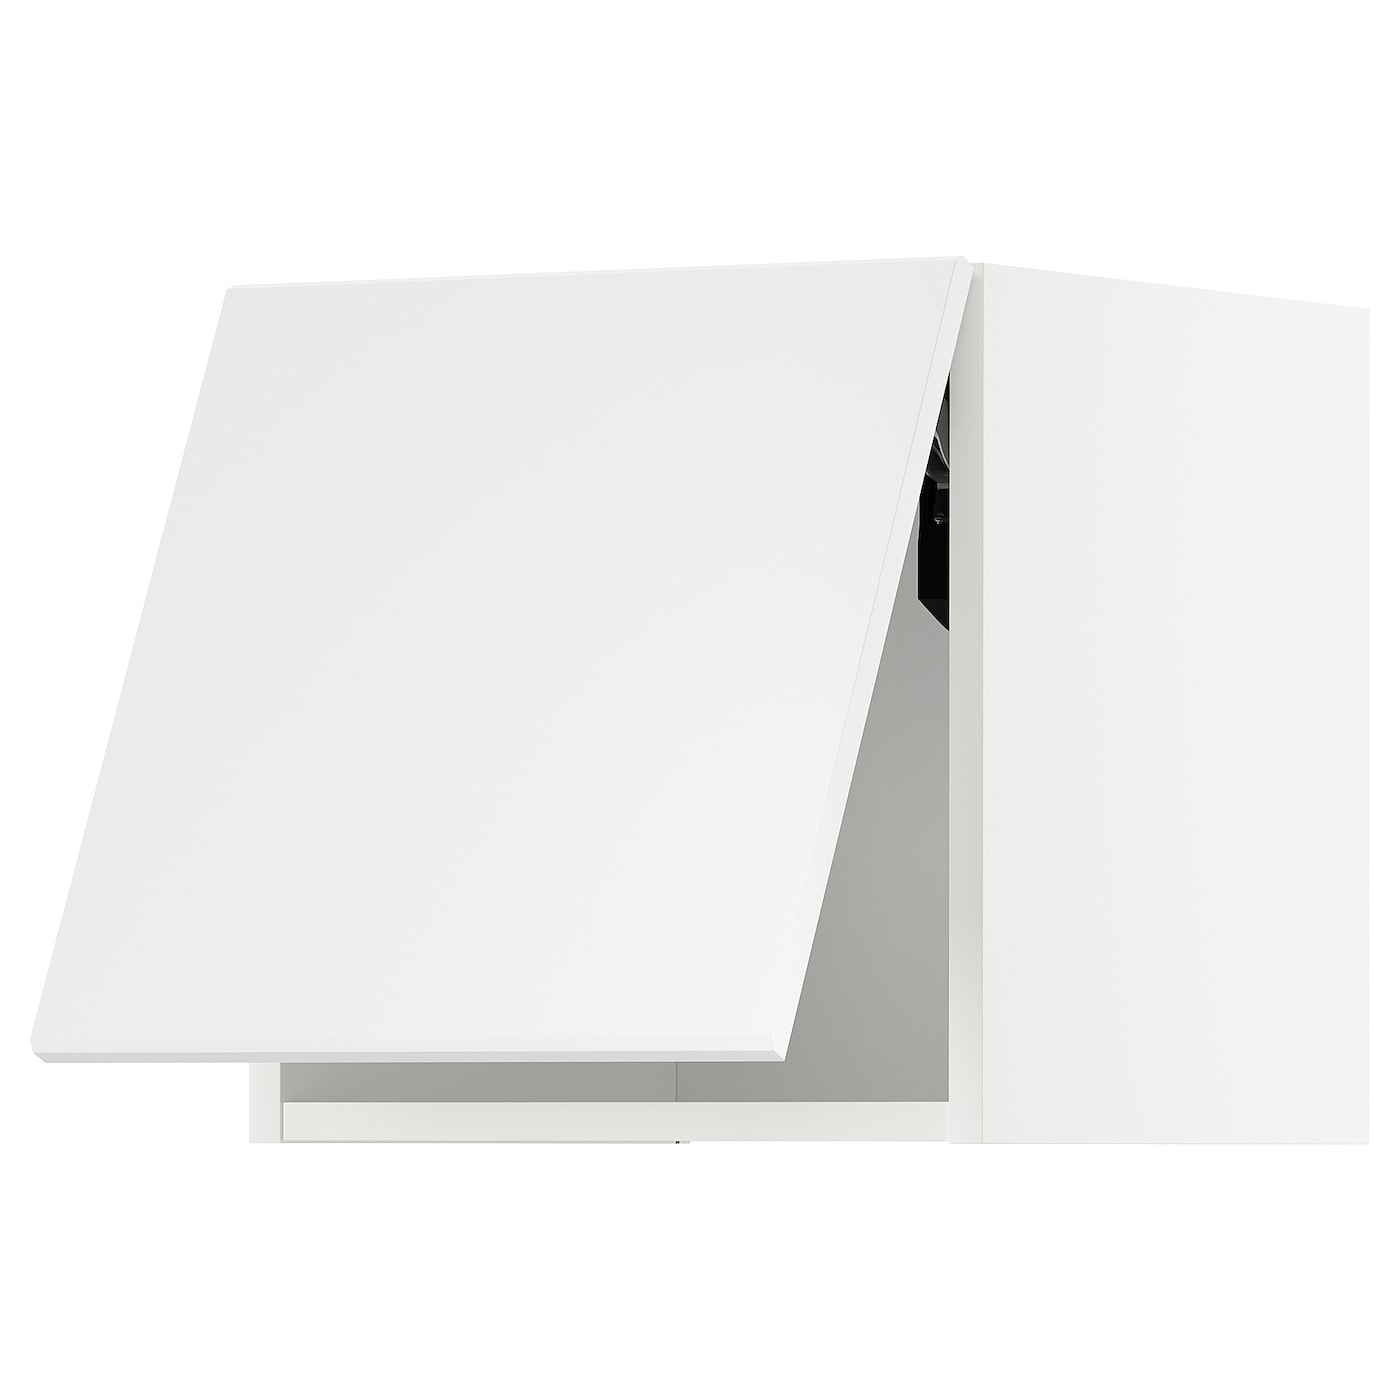 Metod Wall Cabinet Horizontal White Kungsbacka Matt White Ikea